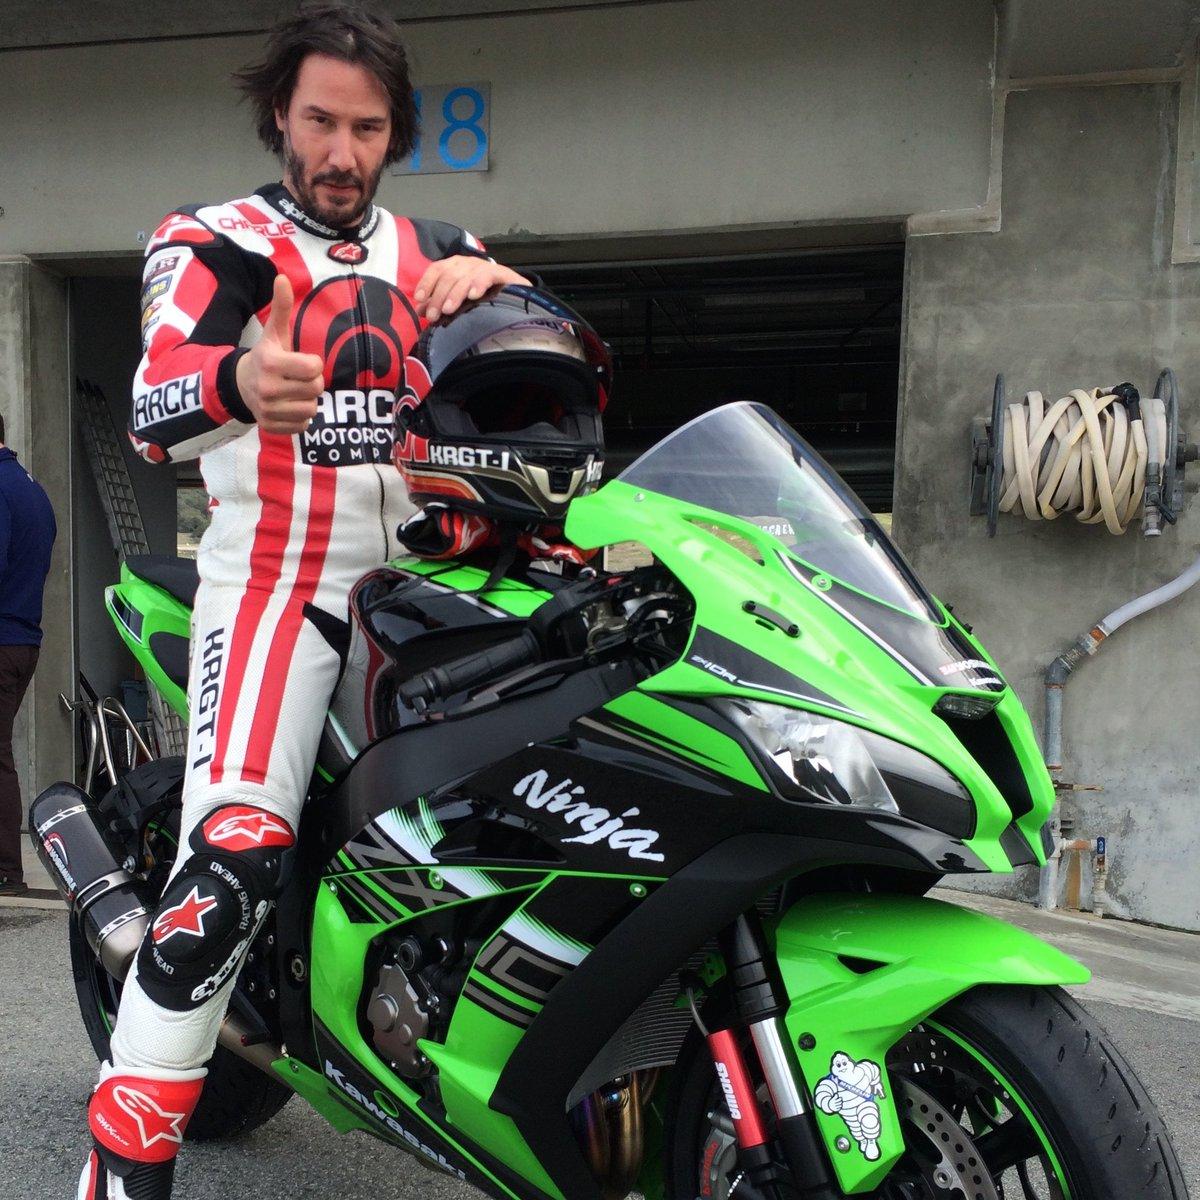 Avid track rider #KeanuReeves gives the Ninja ZX-10R the thumbs up after riding hard on @MazdaRaceway Laguna Seca. https://t.co/bTA4hRAN64